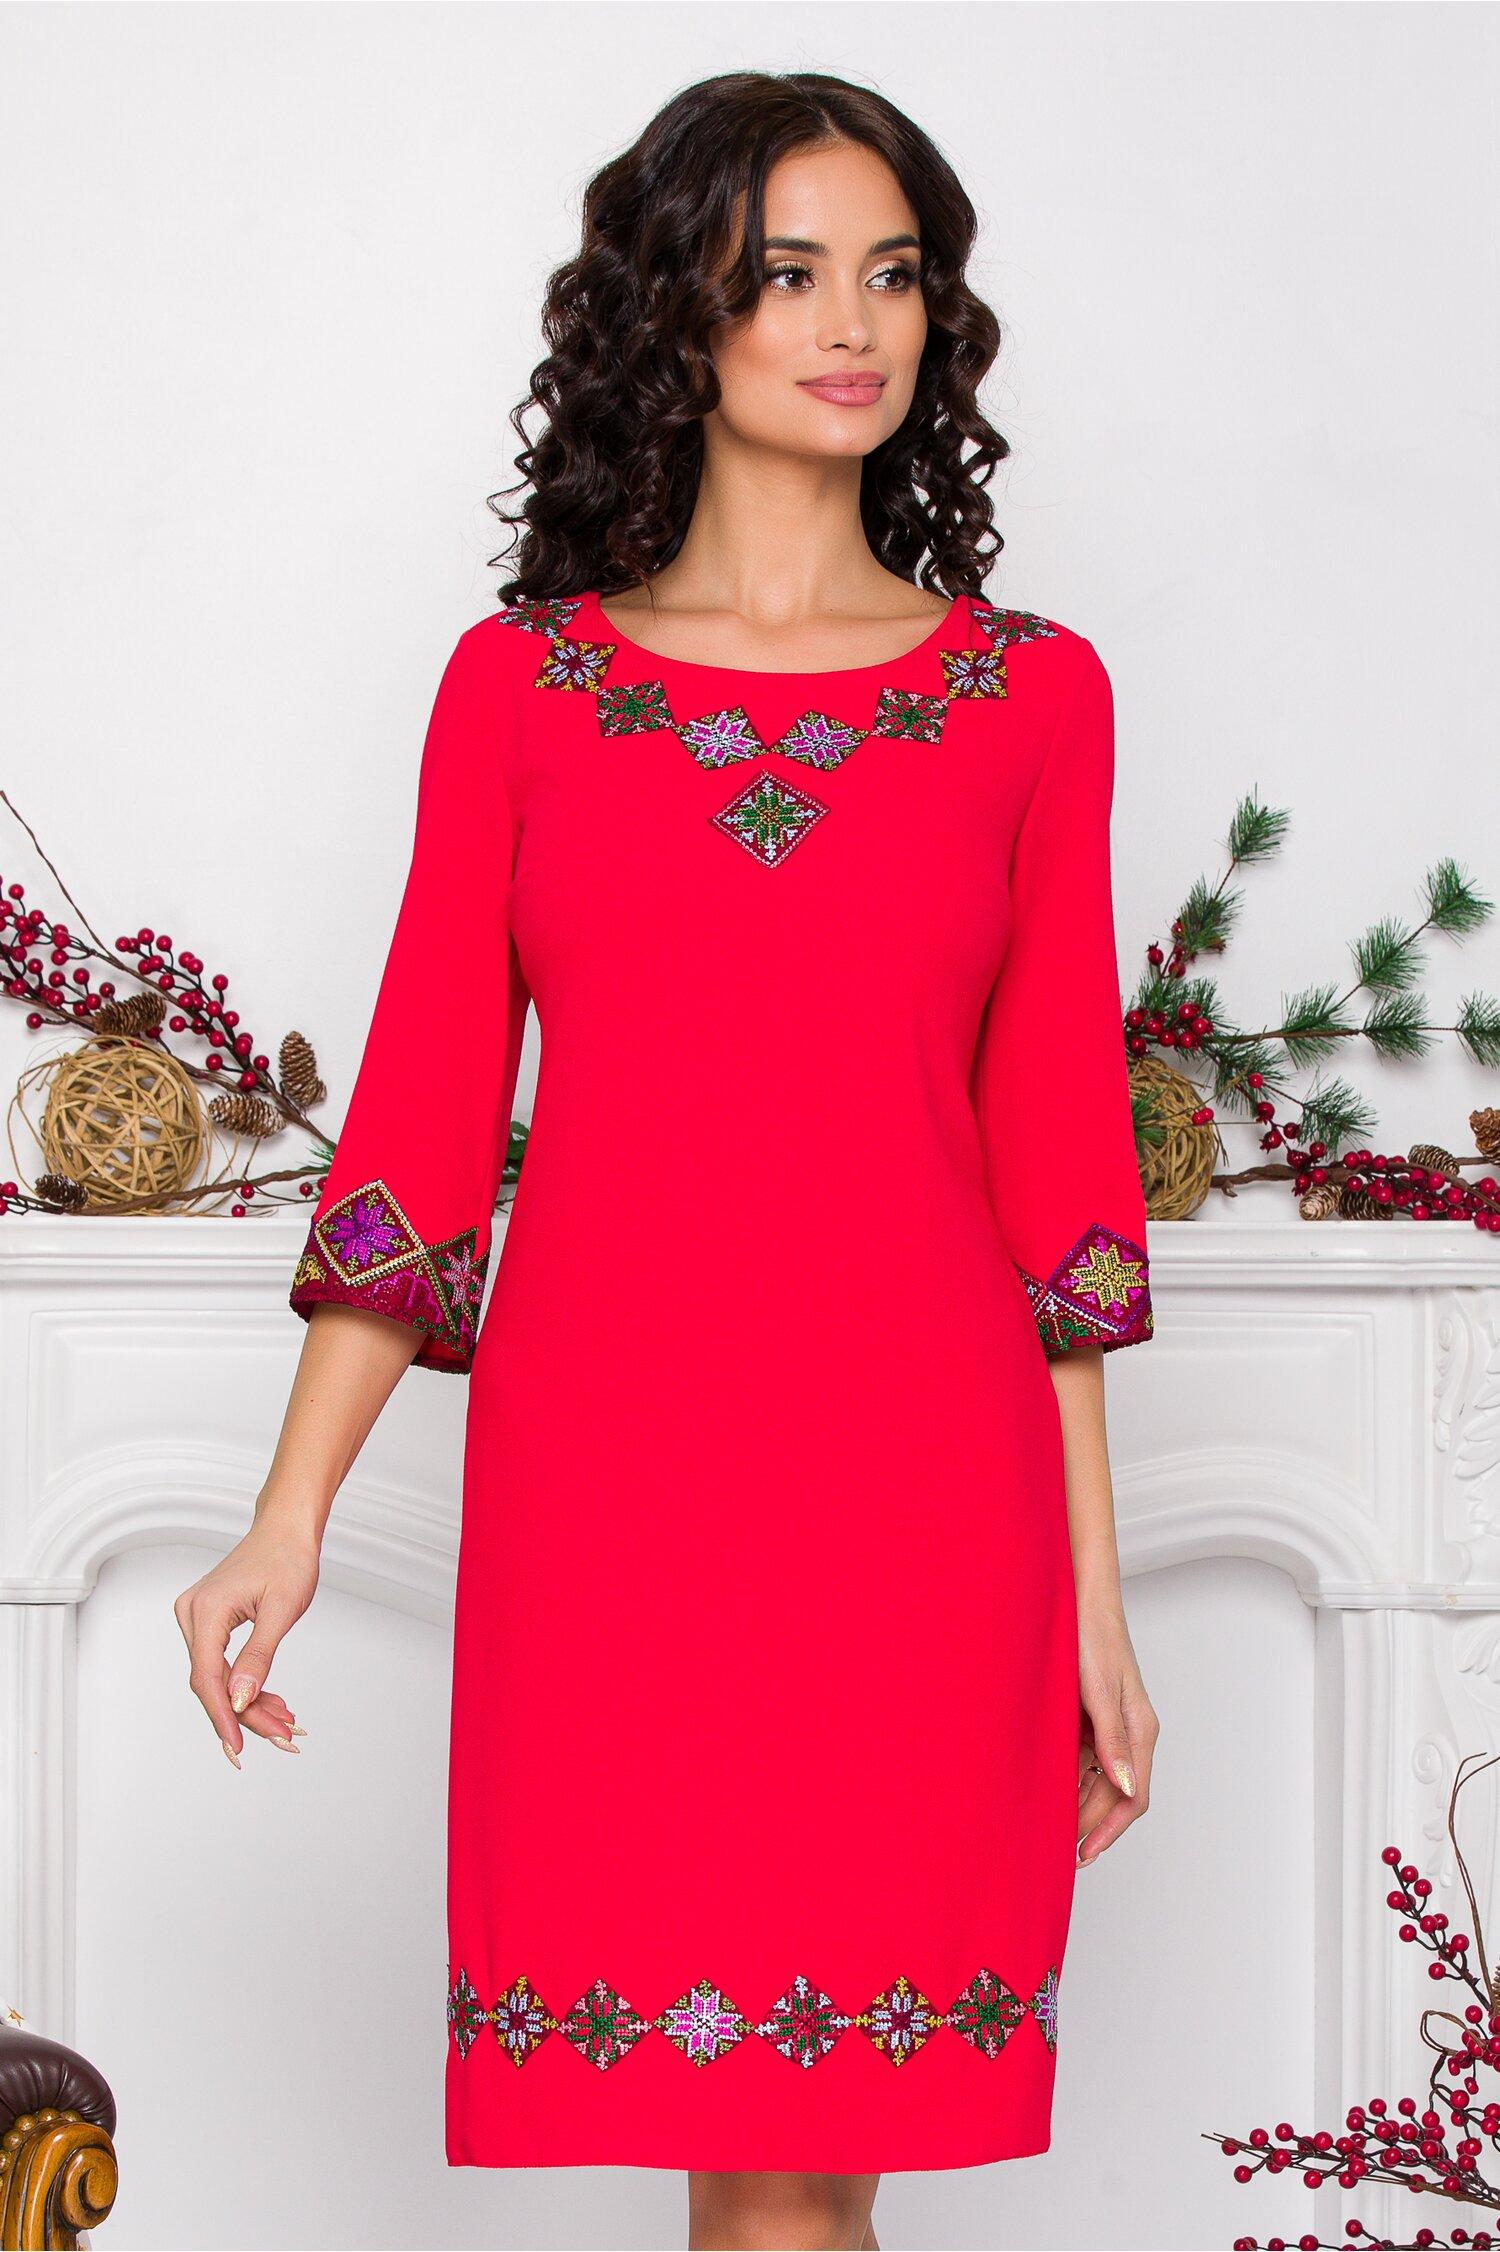 Rochie rosie cu maneci trei sferturi brodata traditional